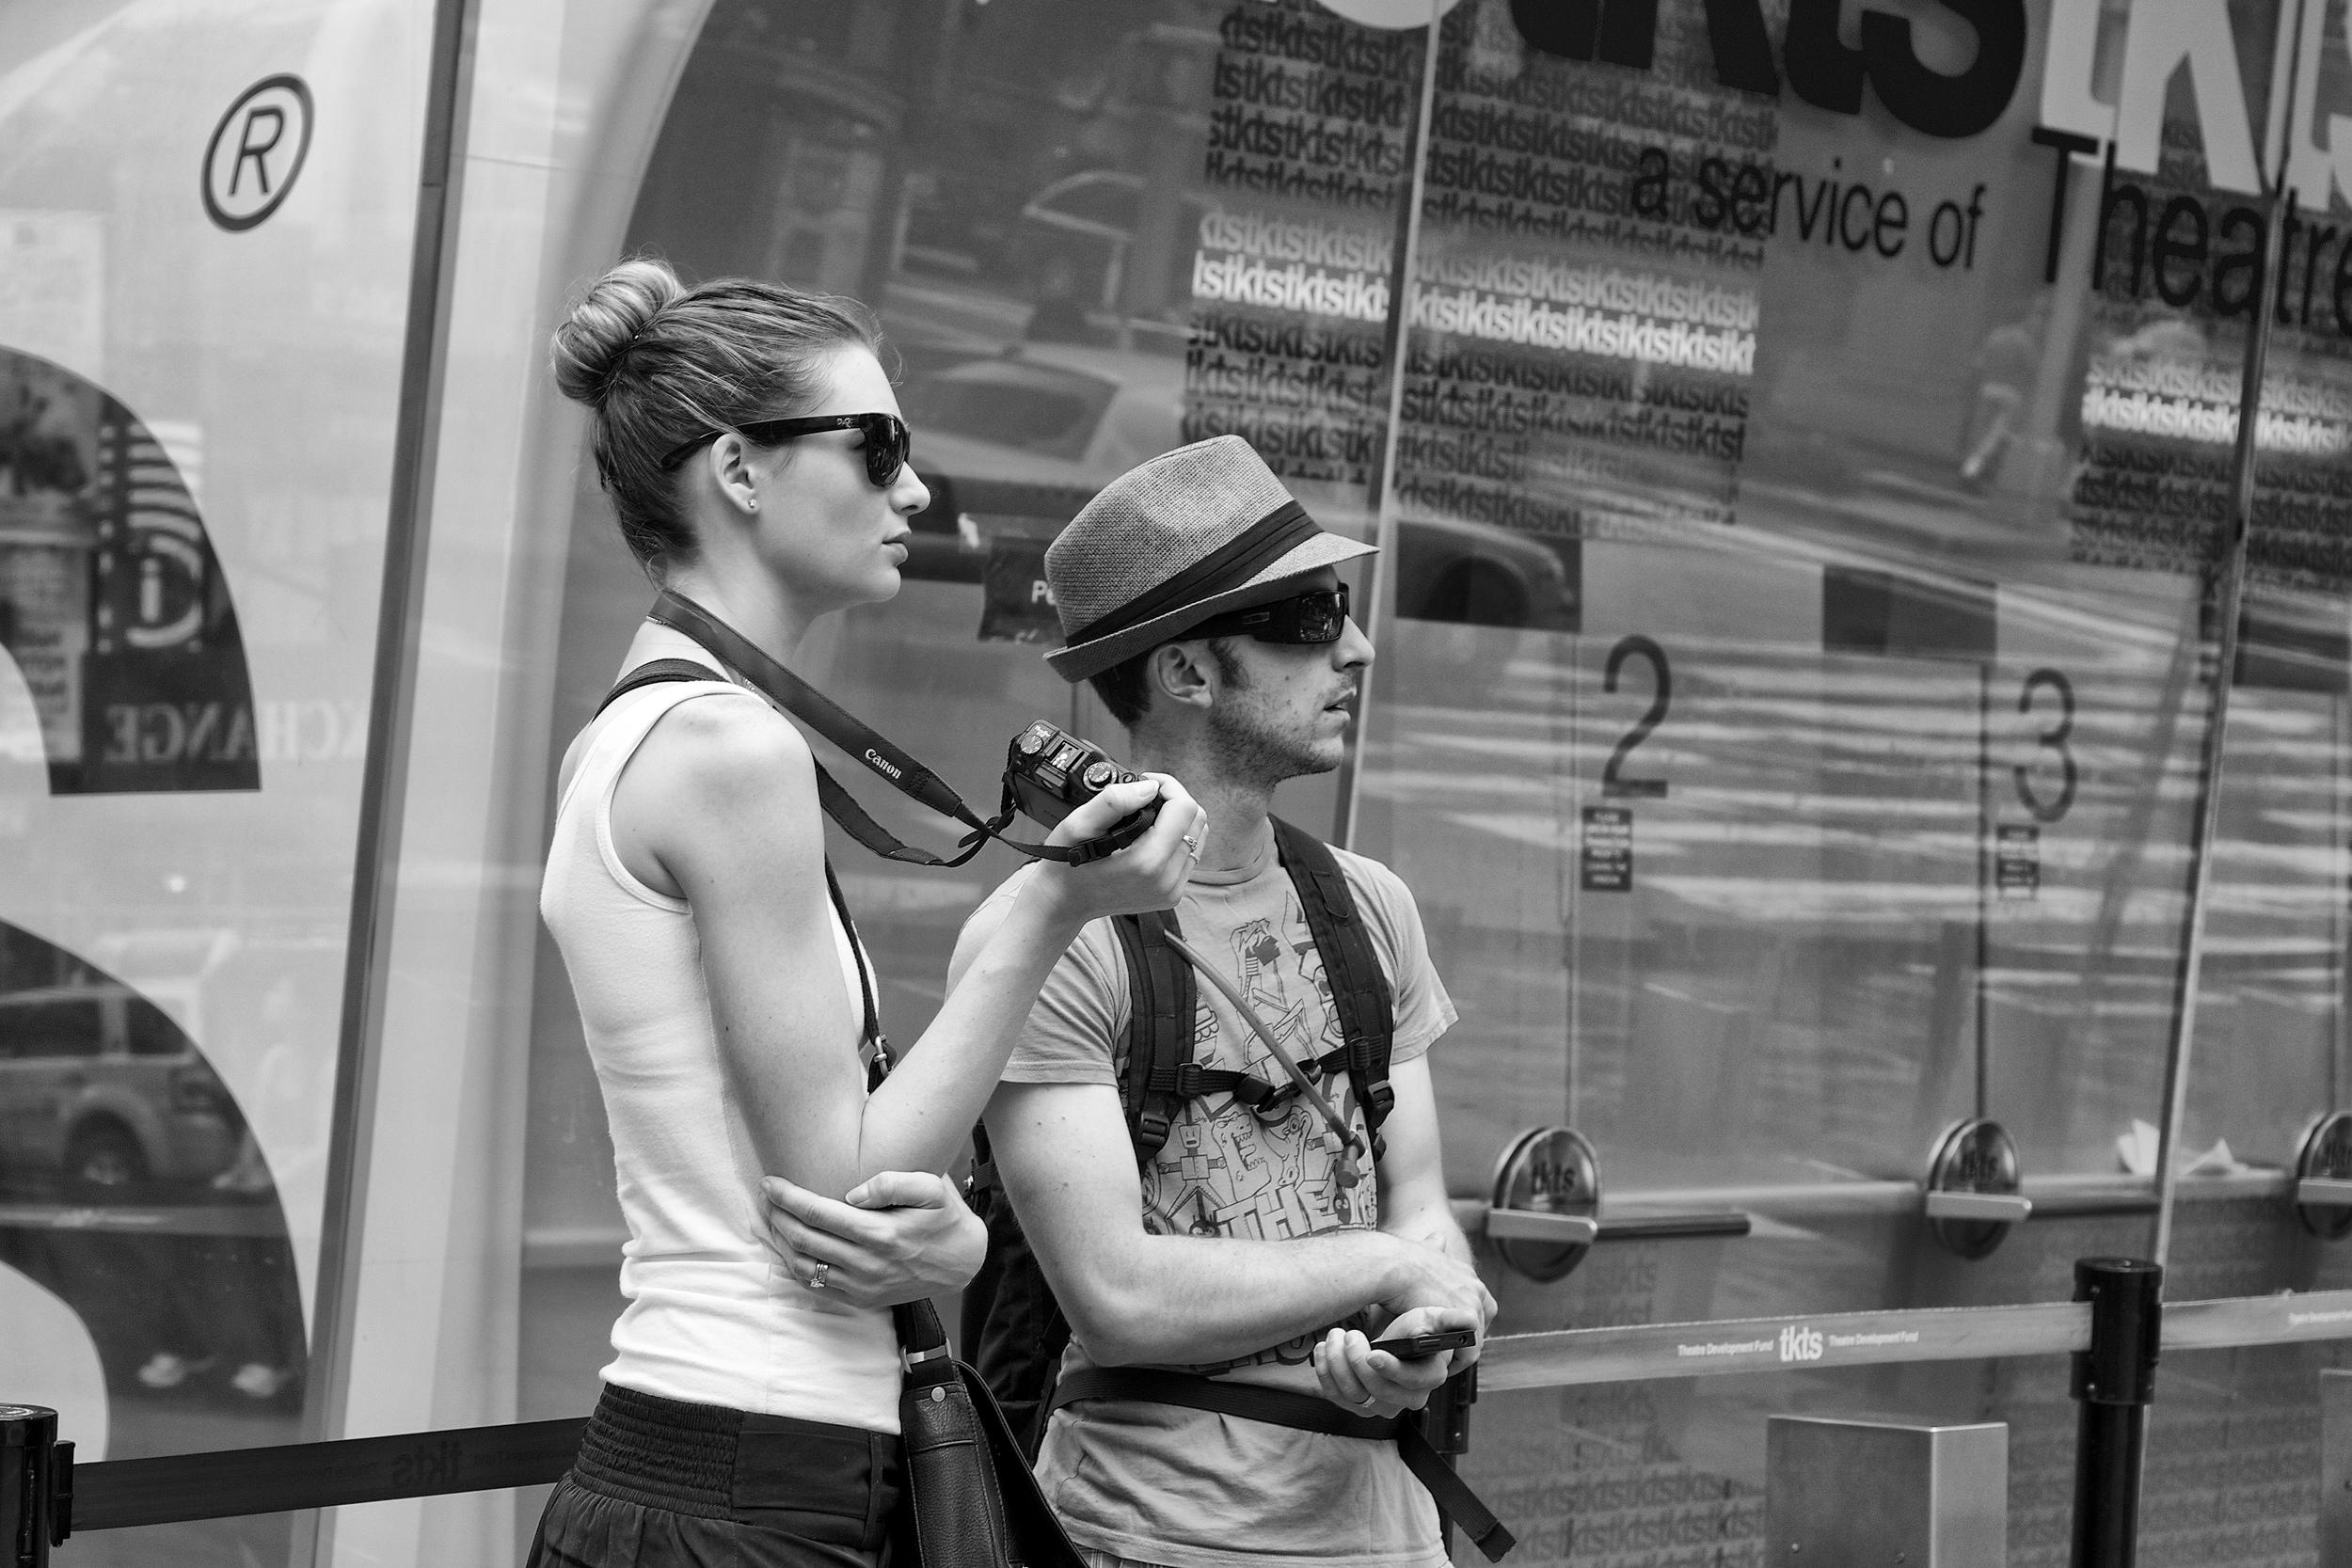 camera and sunglasses